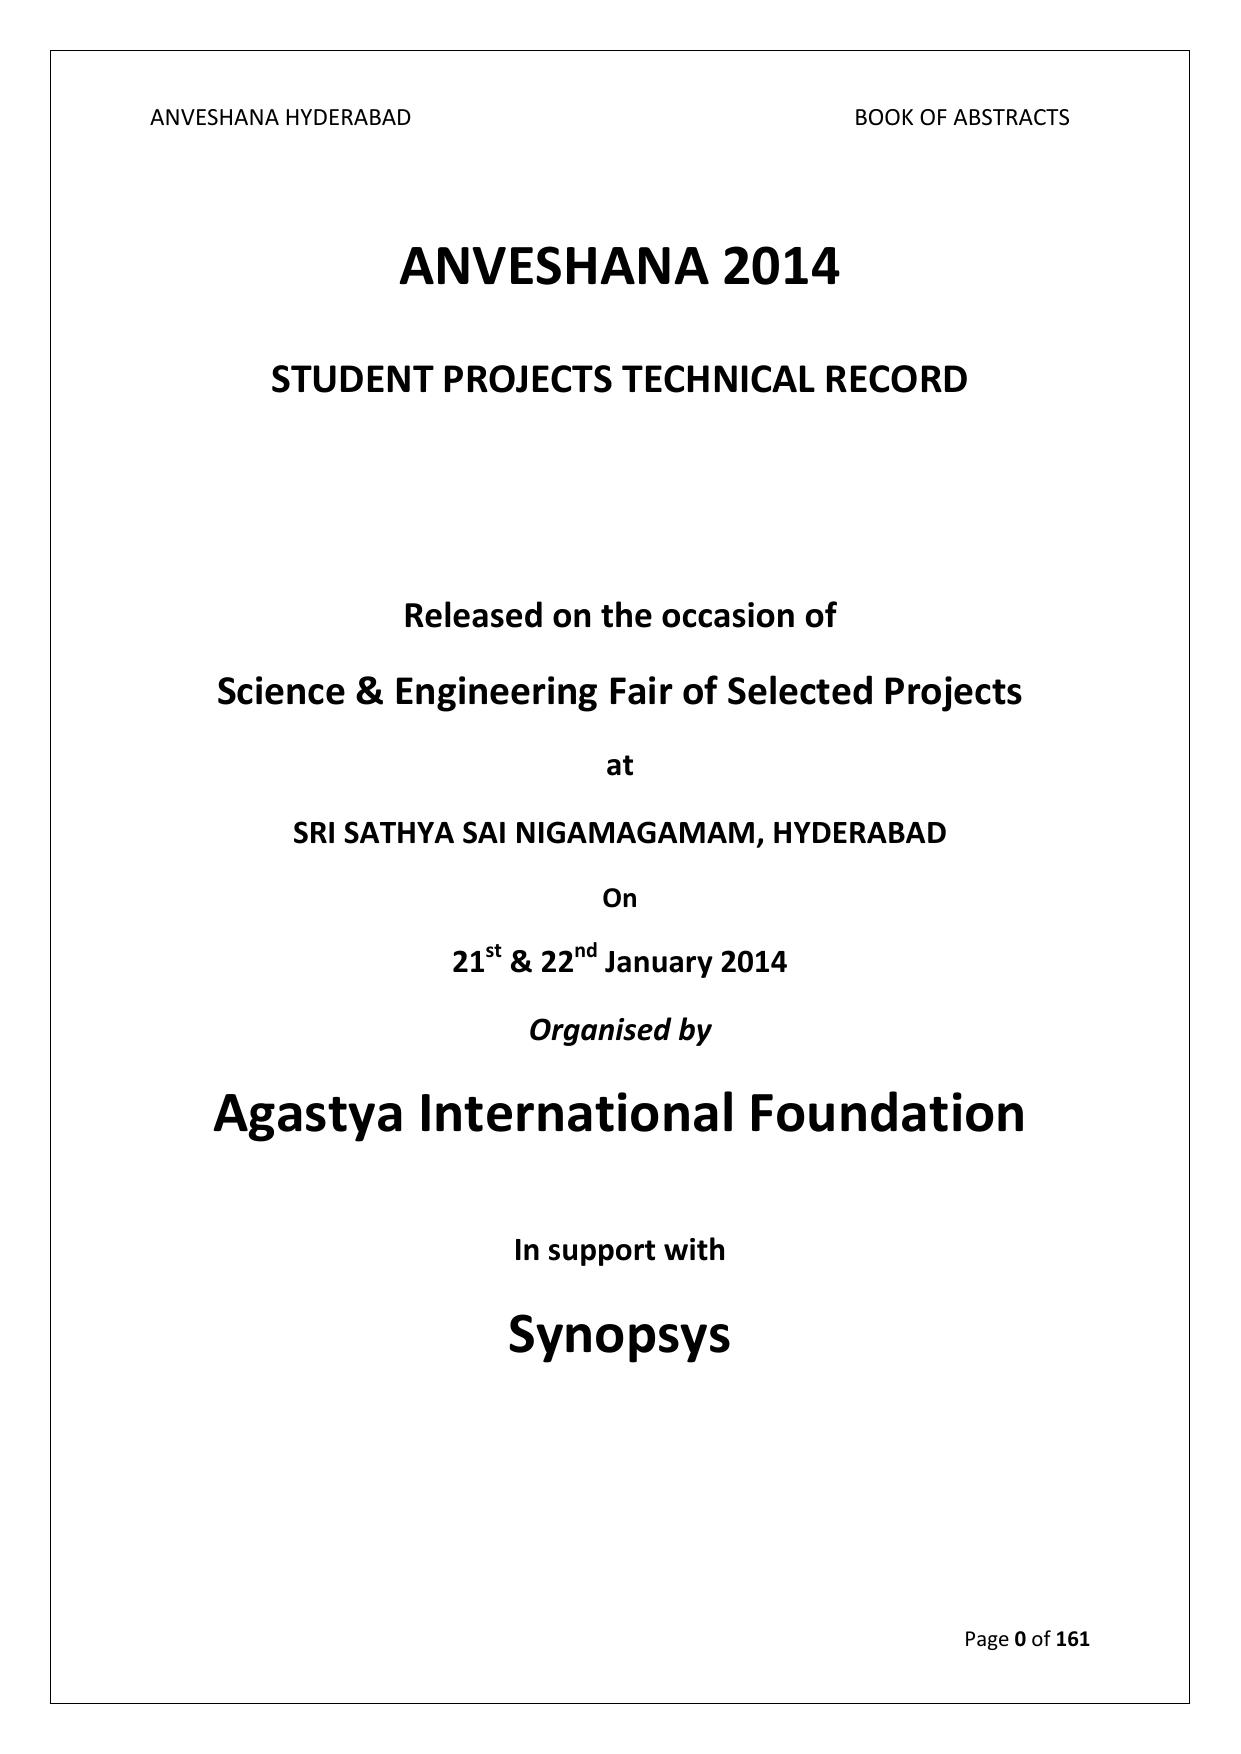 Anveshana 2014 Agastya International Foundation Synopsys Program For 8870 Dtmf Interfacing With 8051